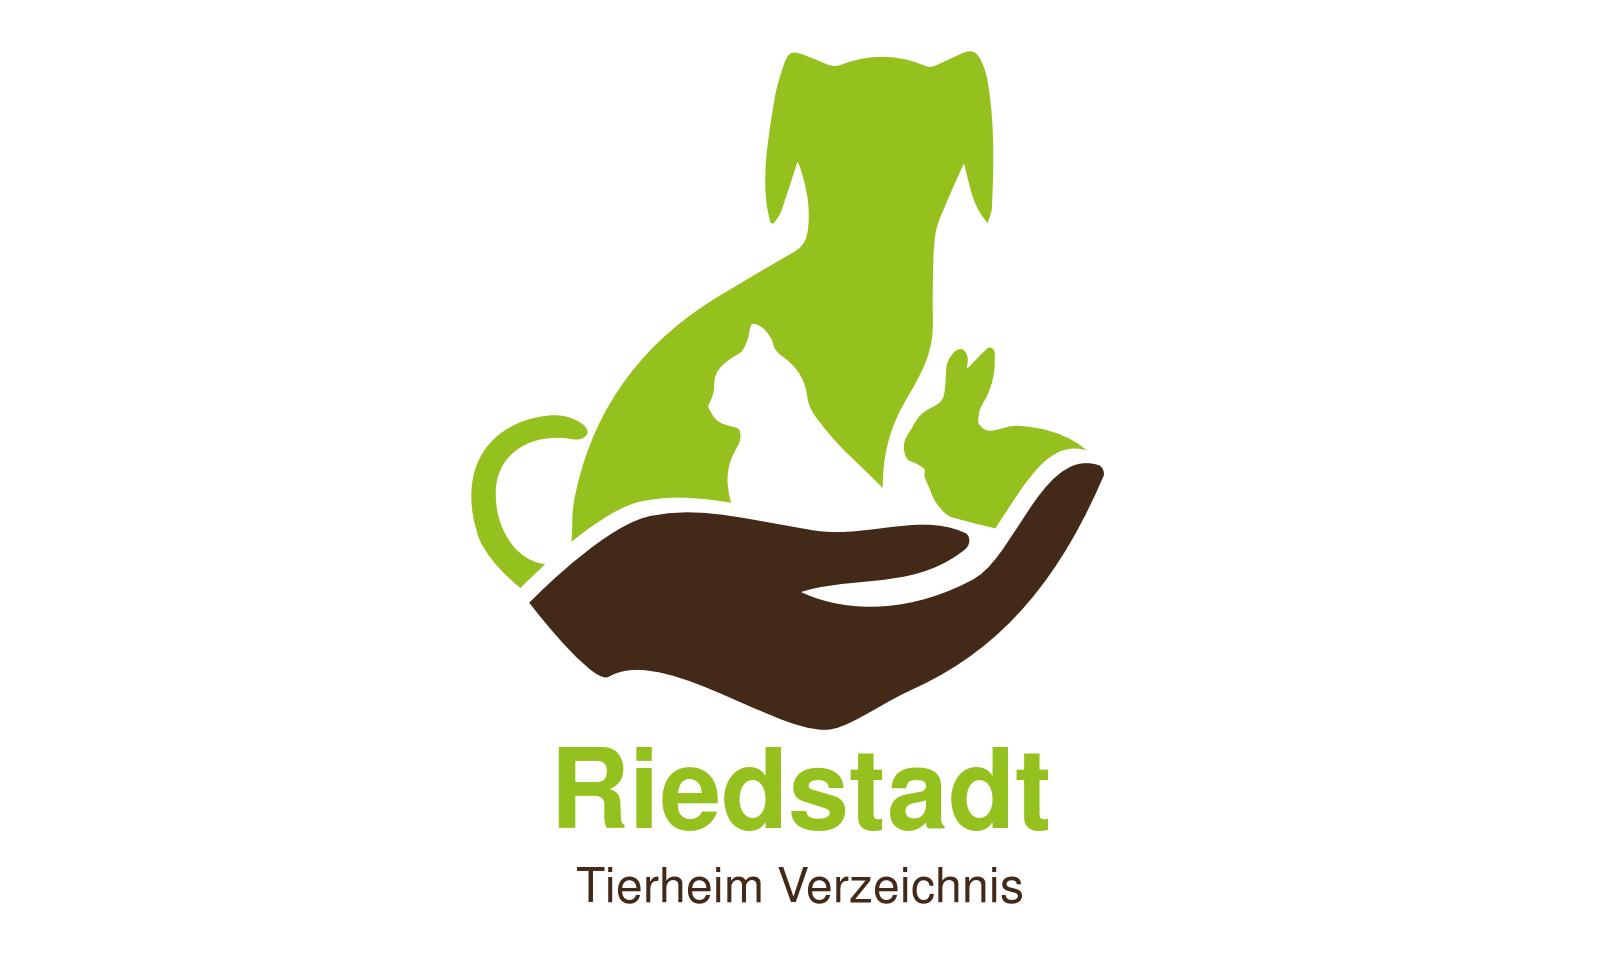 Tierheim Riedstadt